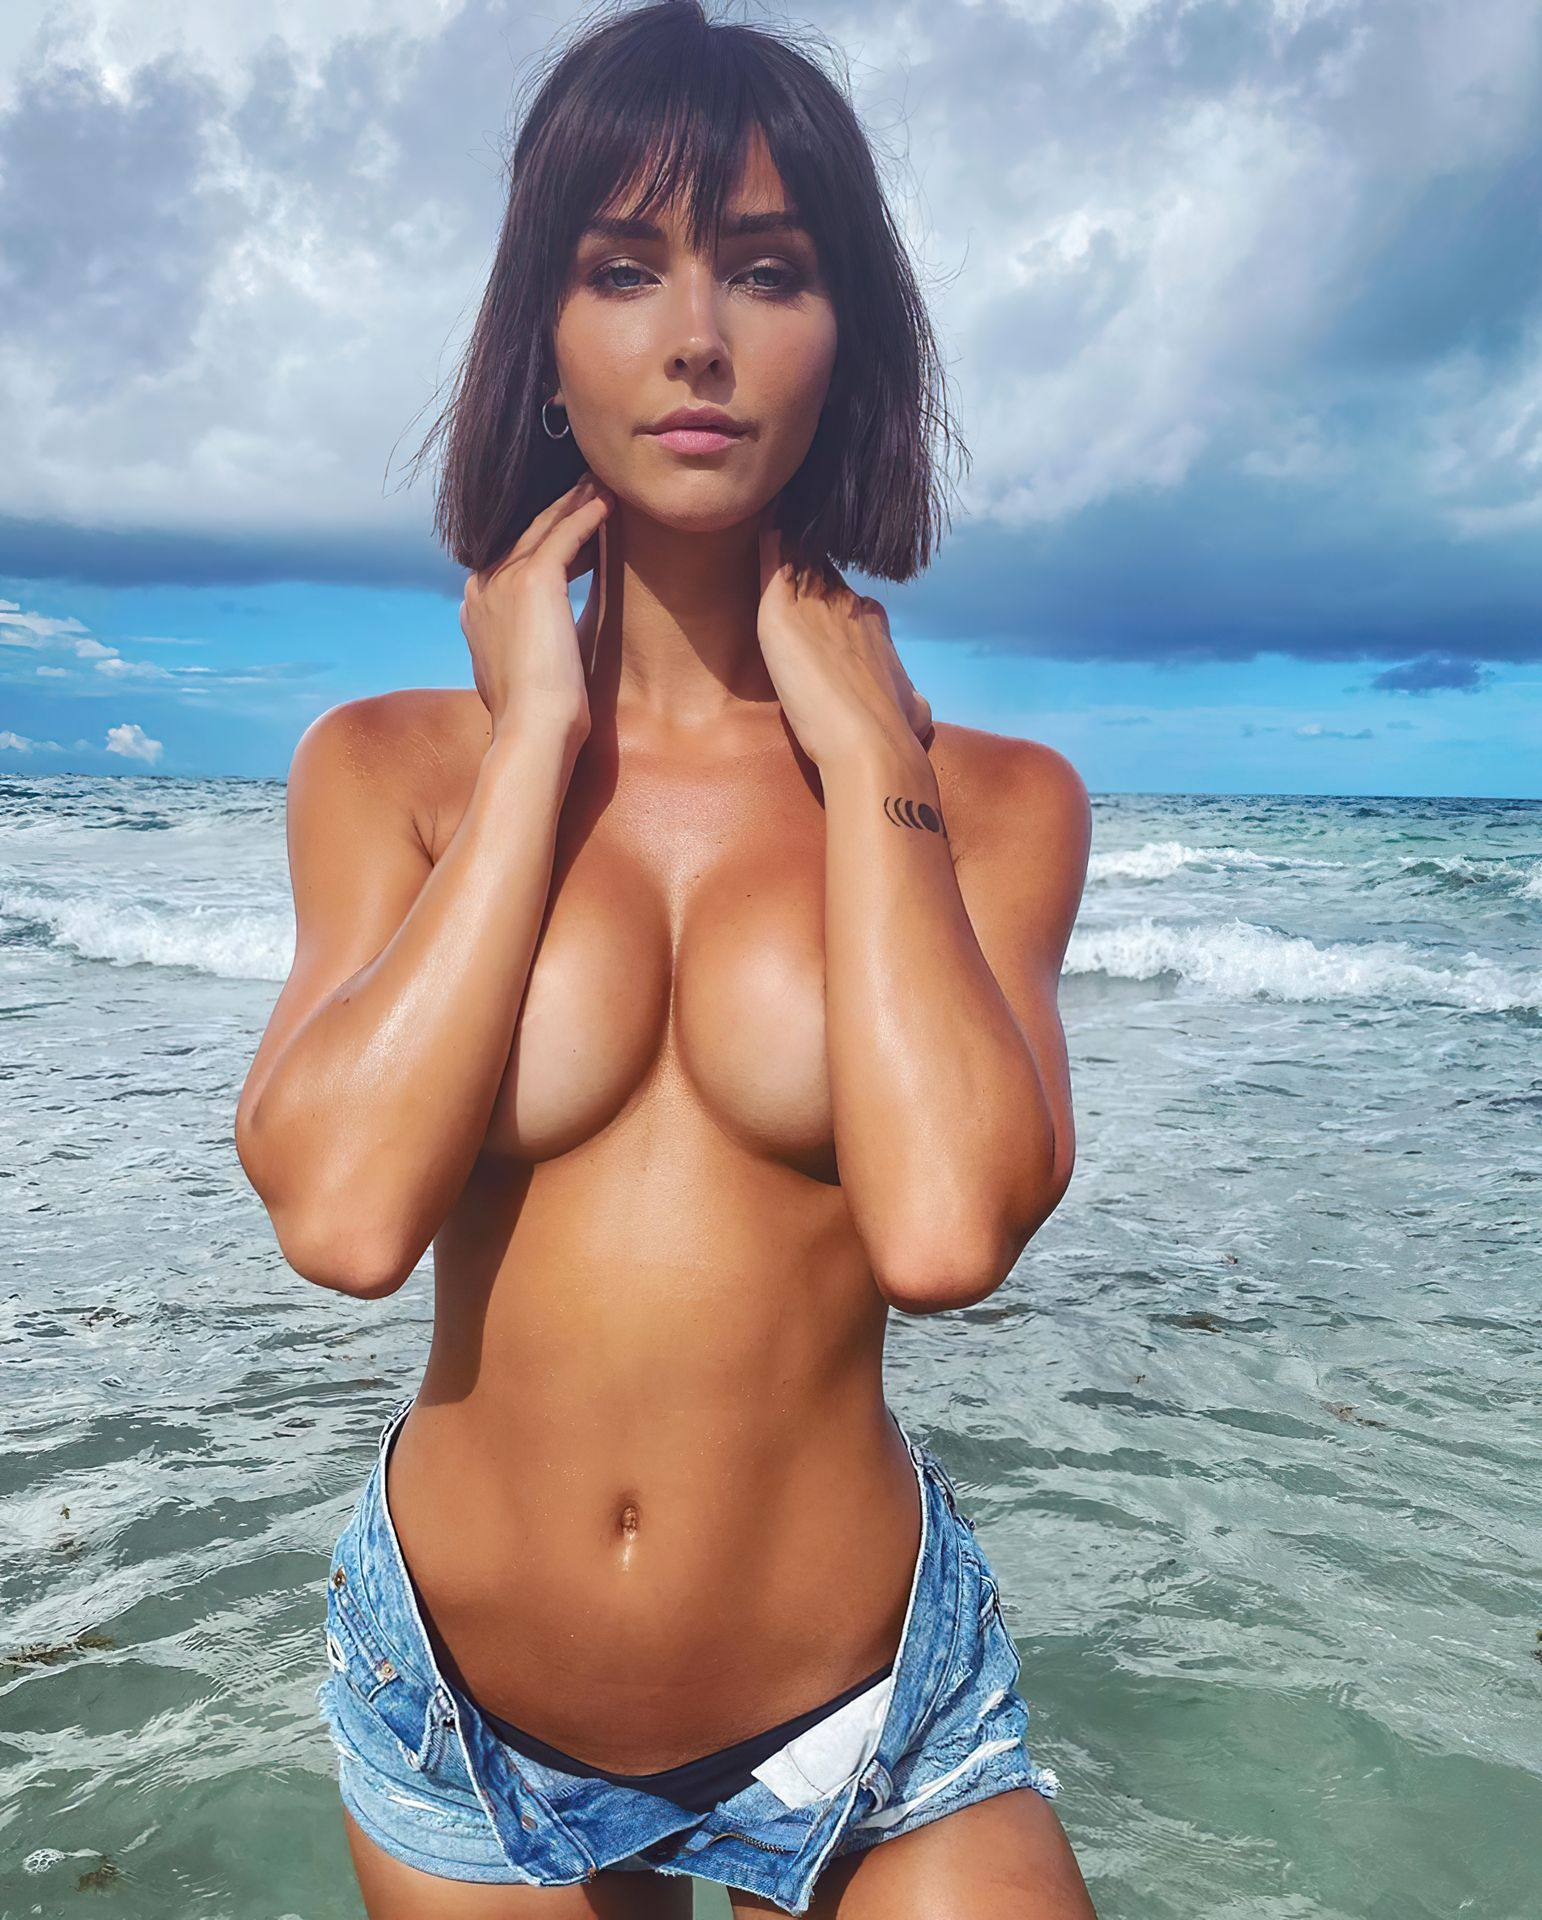 Rachel Cook Amazing Body In Topless Pic